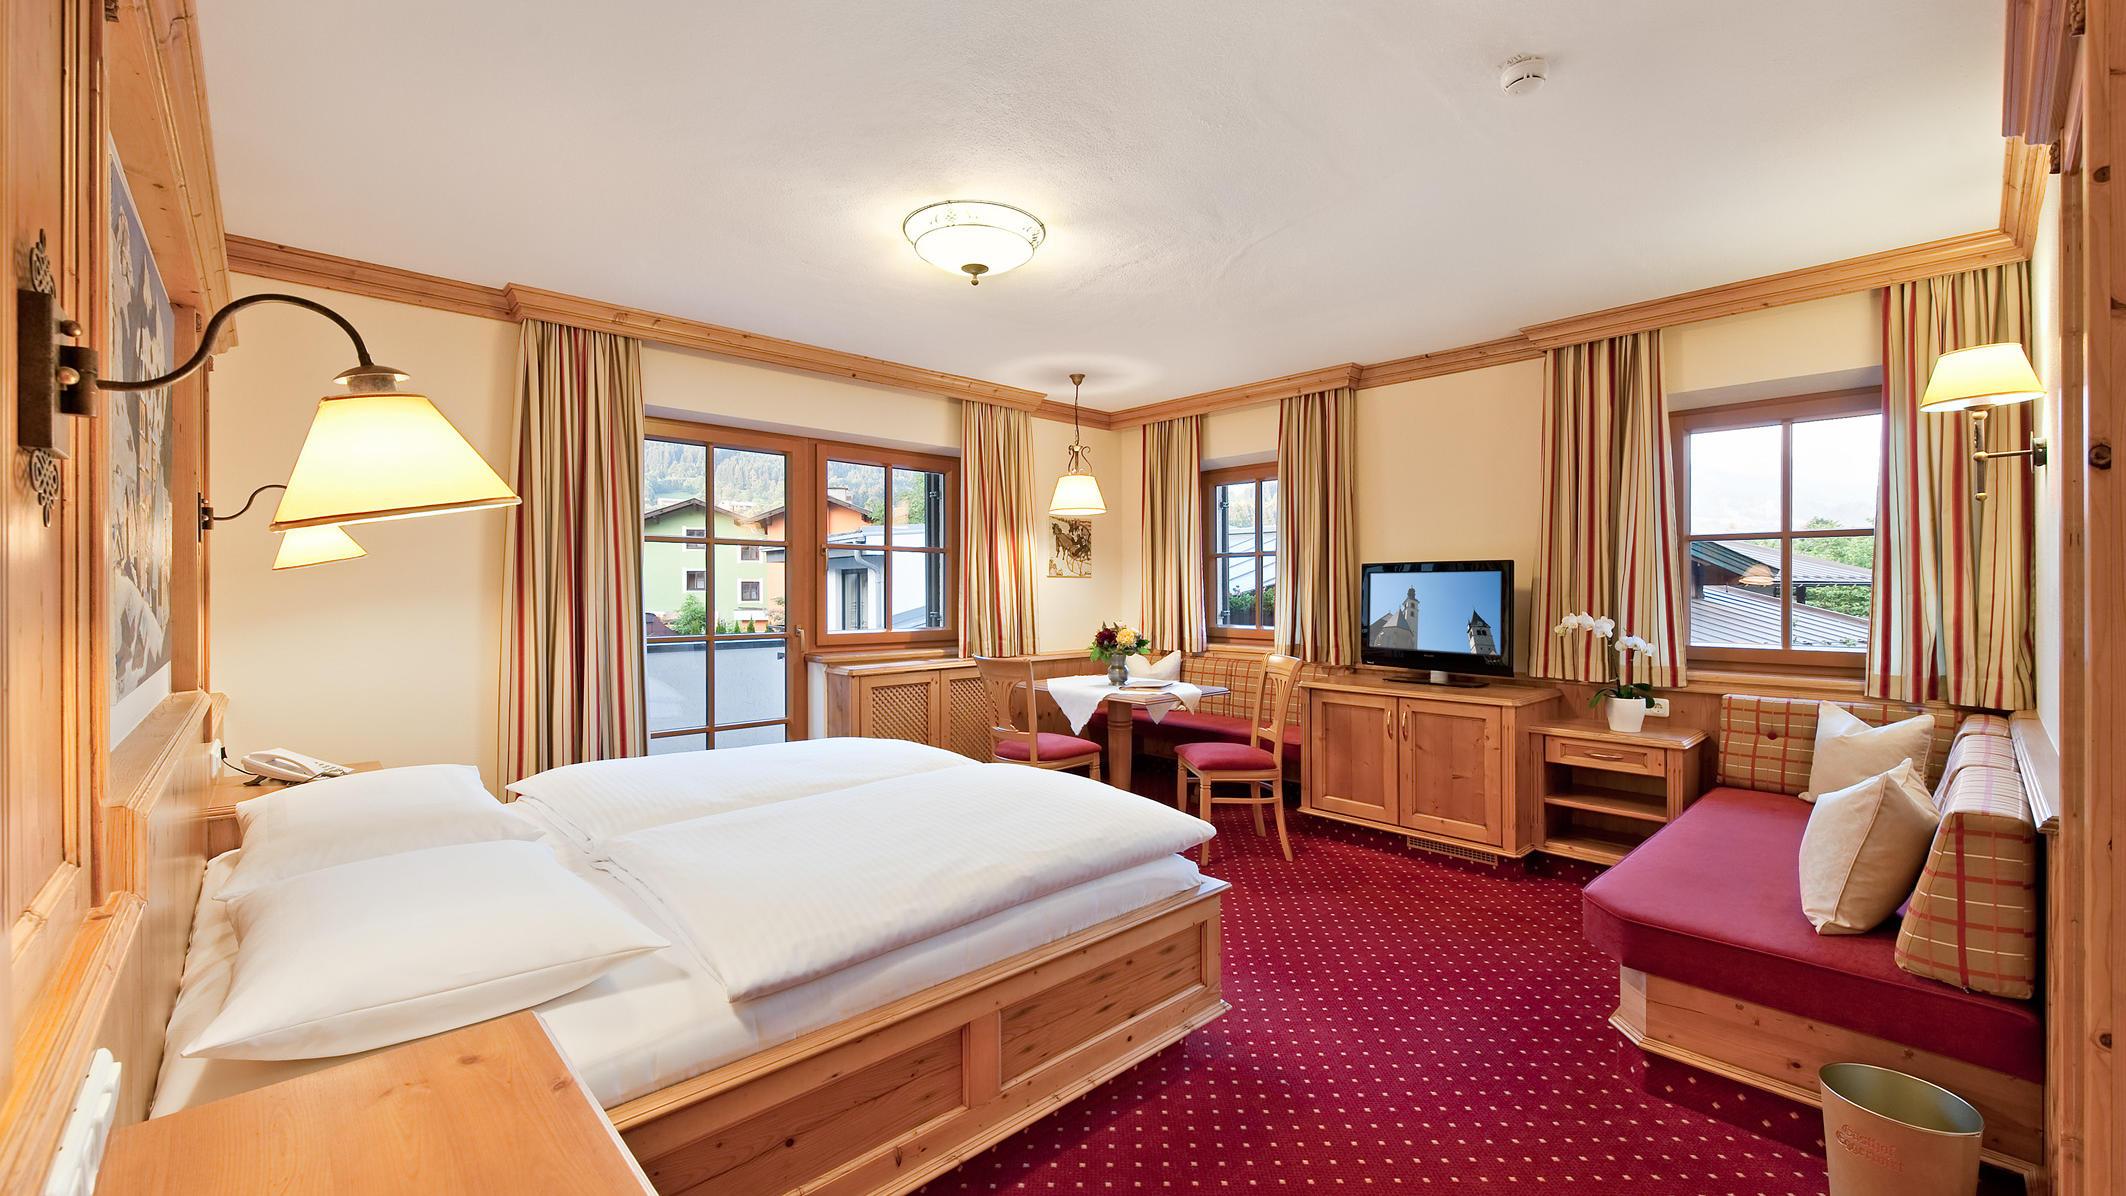 Double Room at Gasthof Eggerwirt Hotel in Kitzbühel, Austria